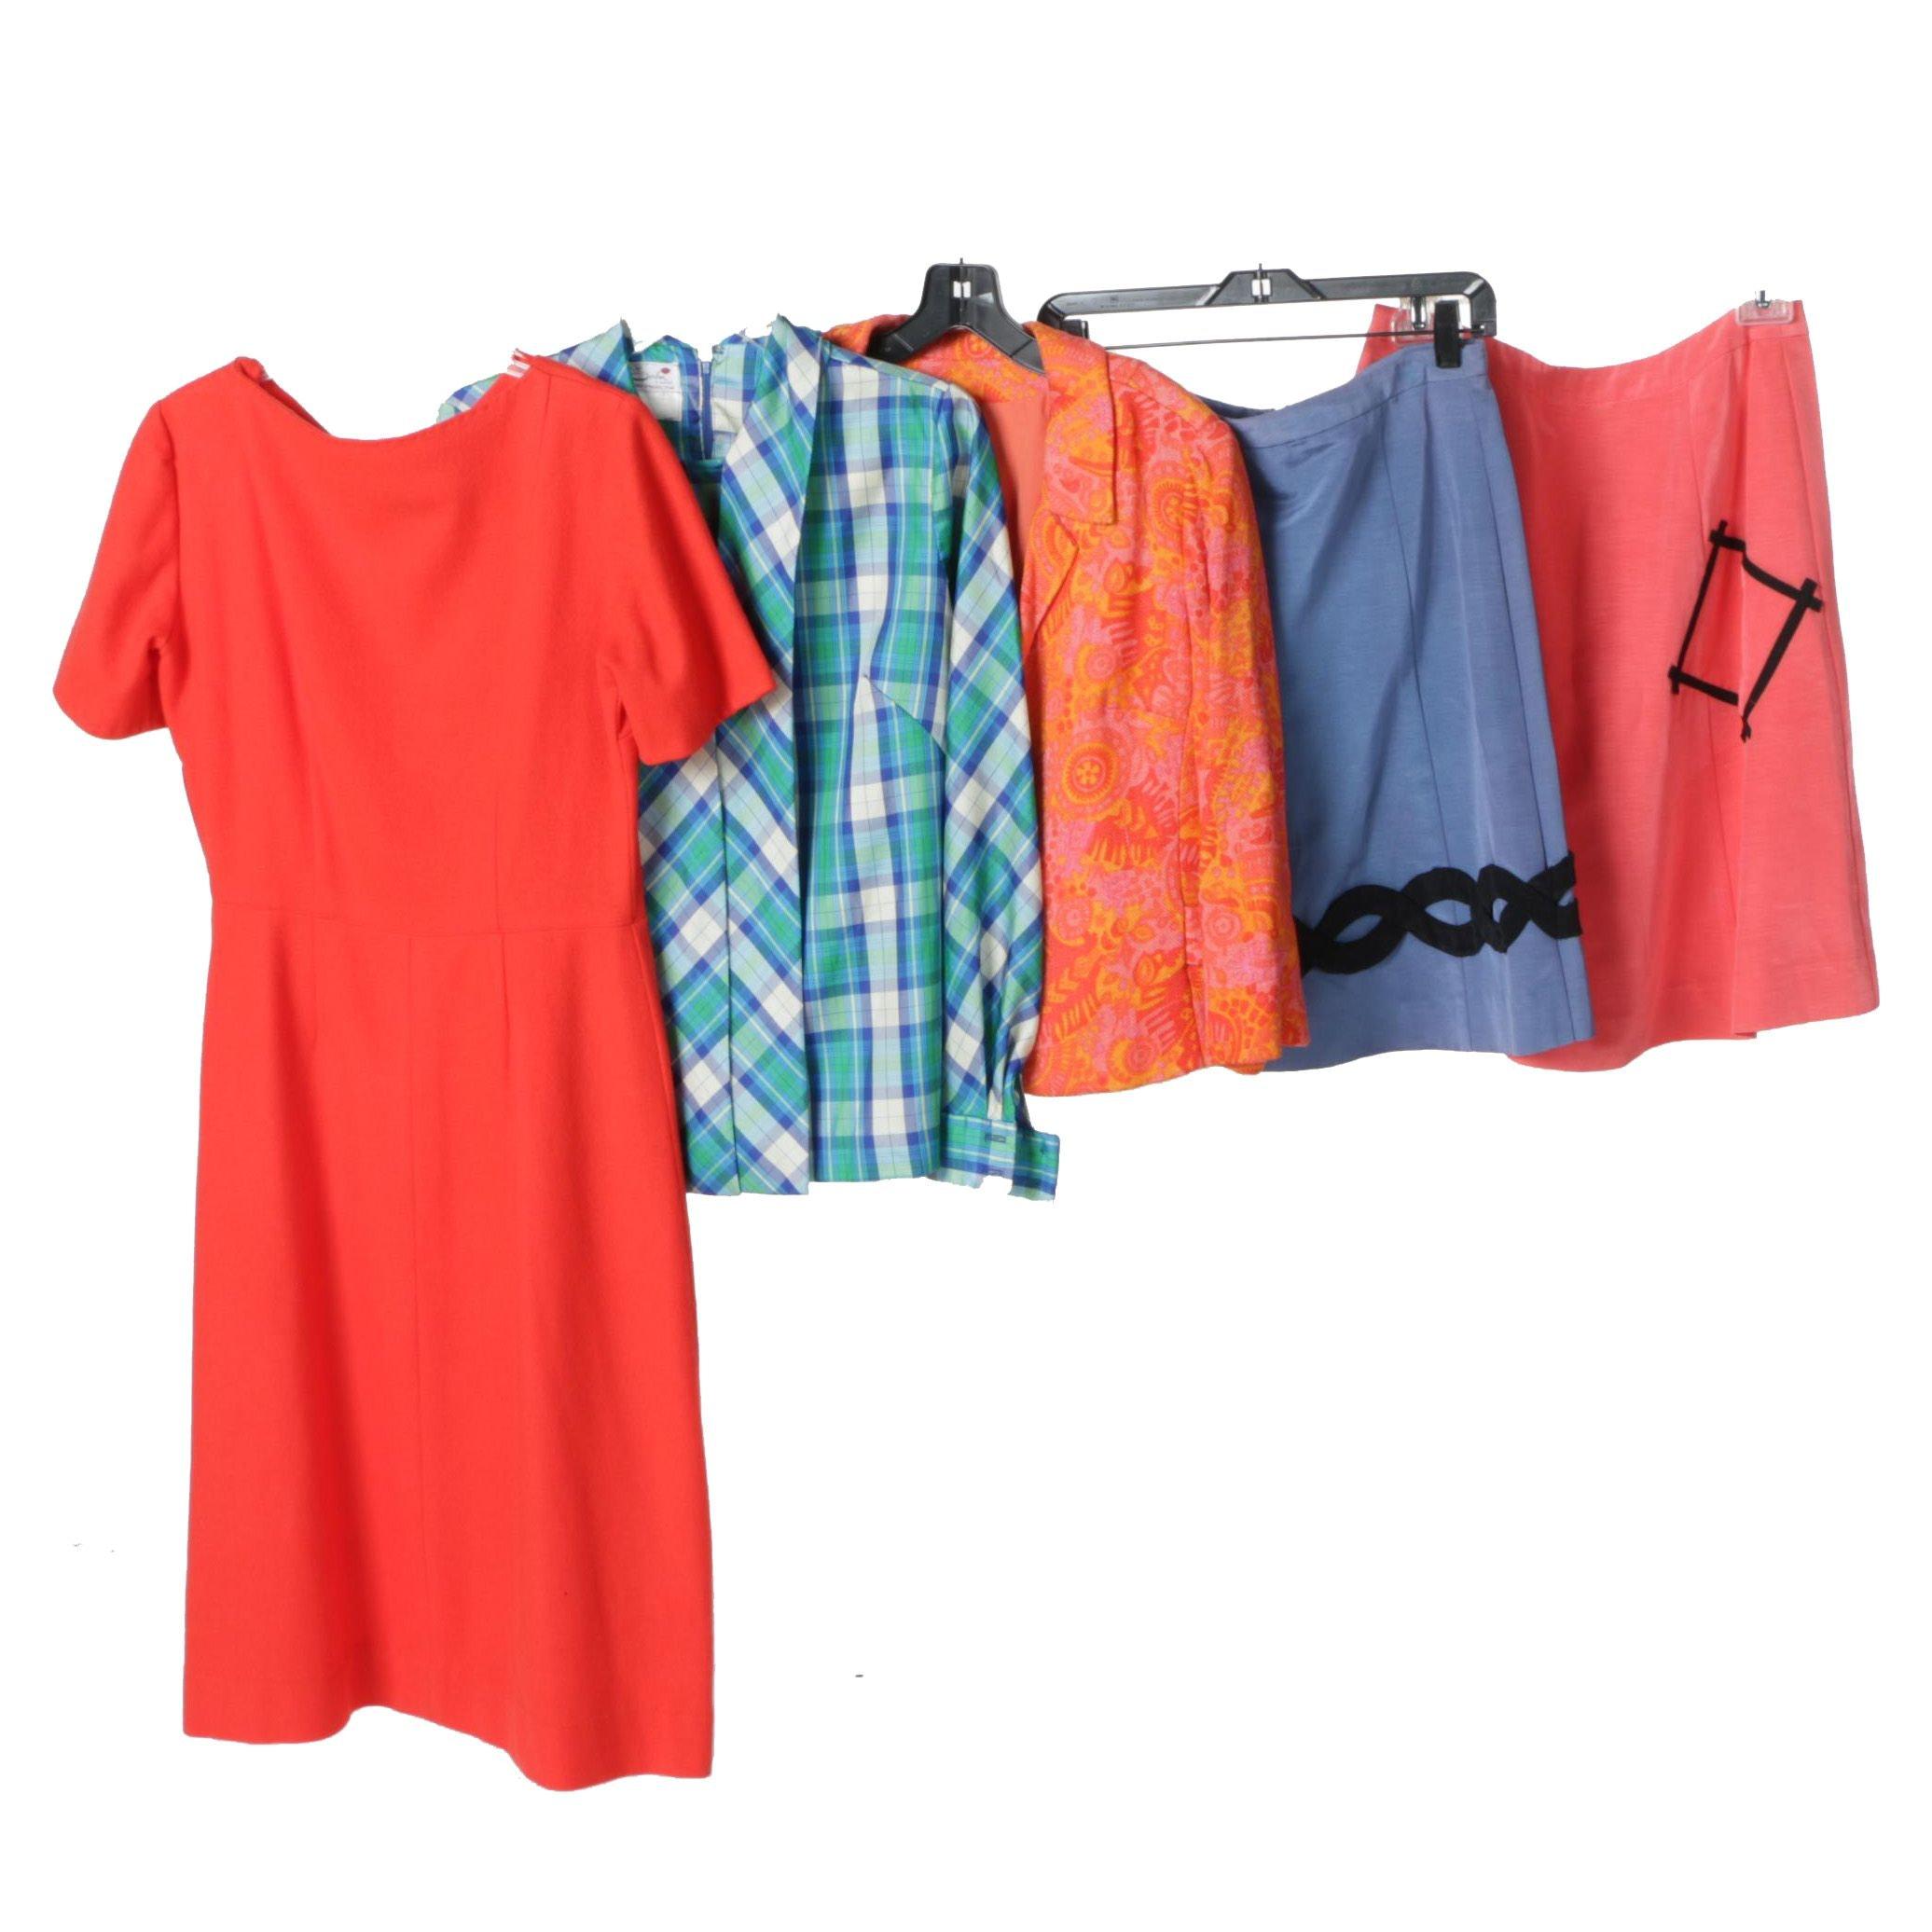 Women's Vintage Clothing Including Josephine Sasso New York